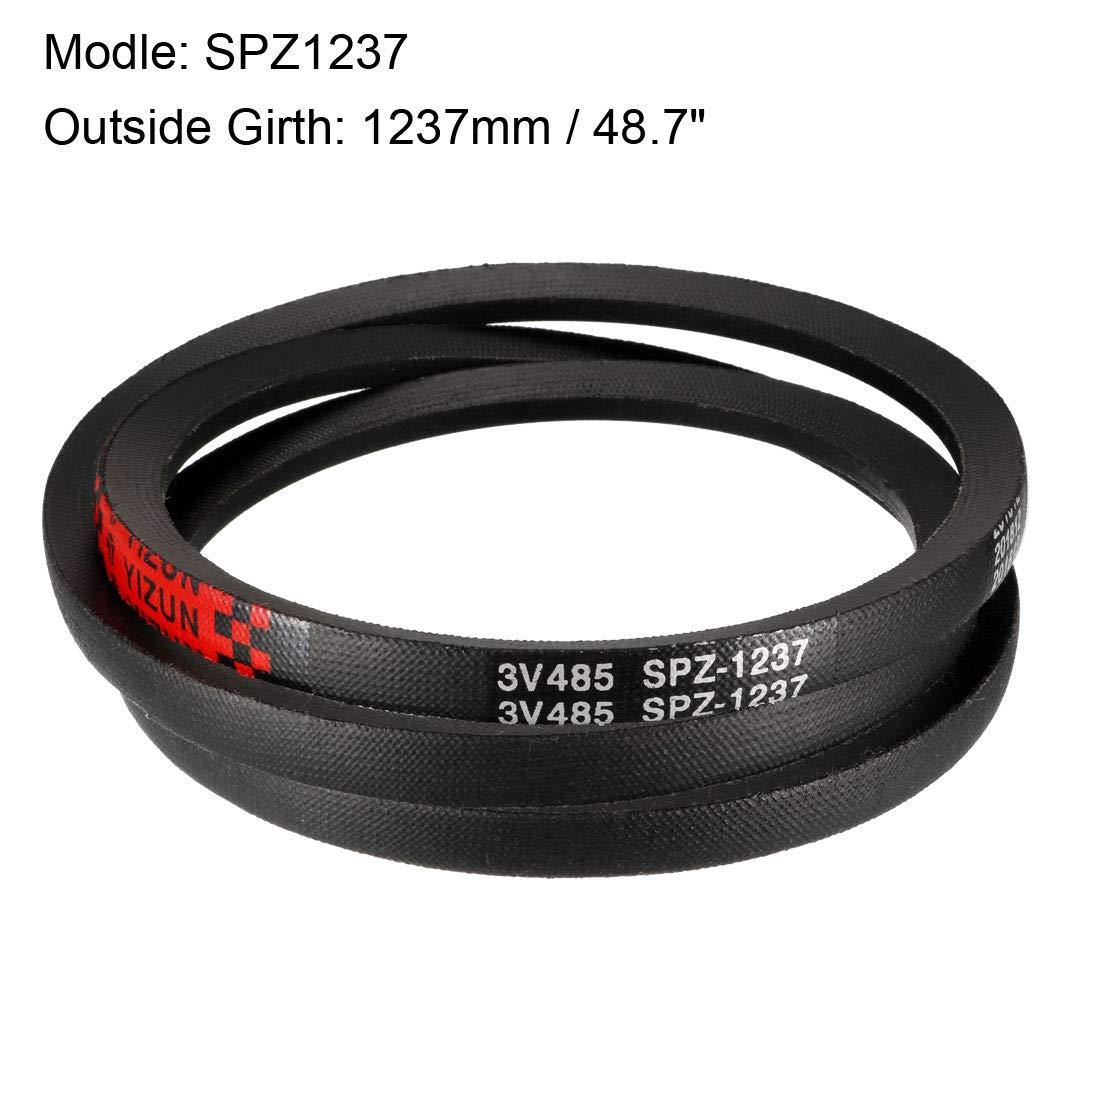 uxcell/® SPZ1462 Drive V-Belt Outside Girth 1462mm Industrial Power Rubber Transmission Belt